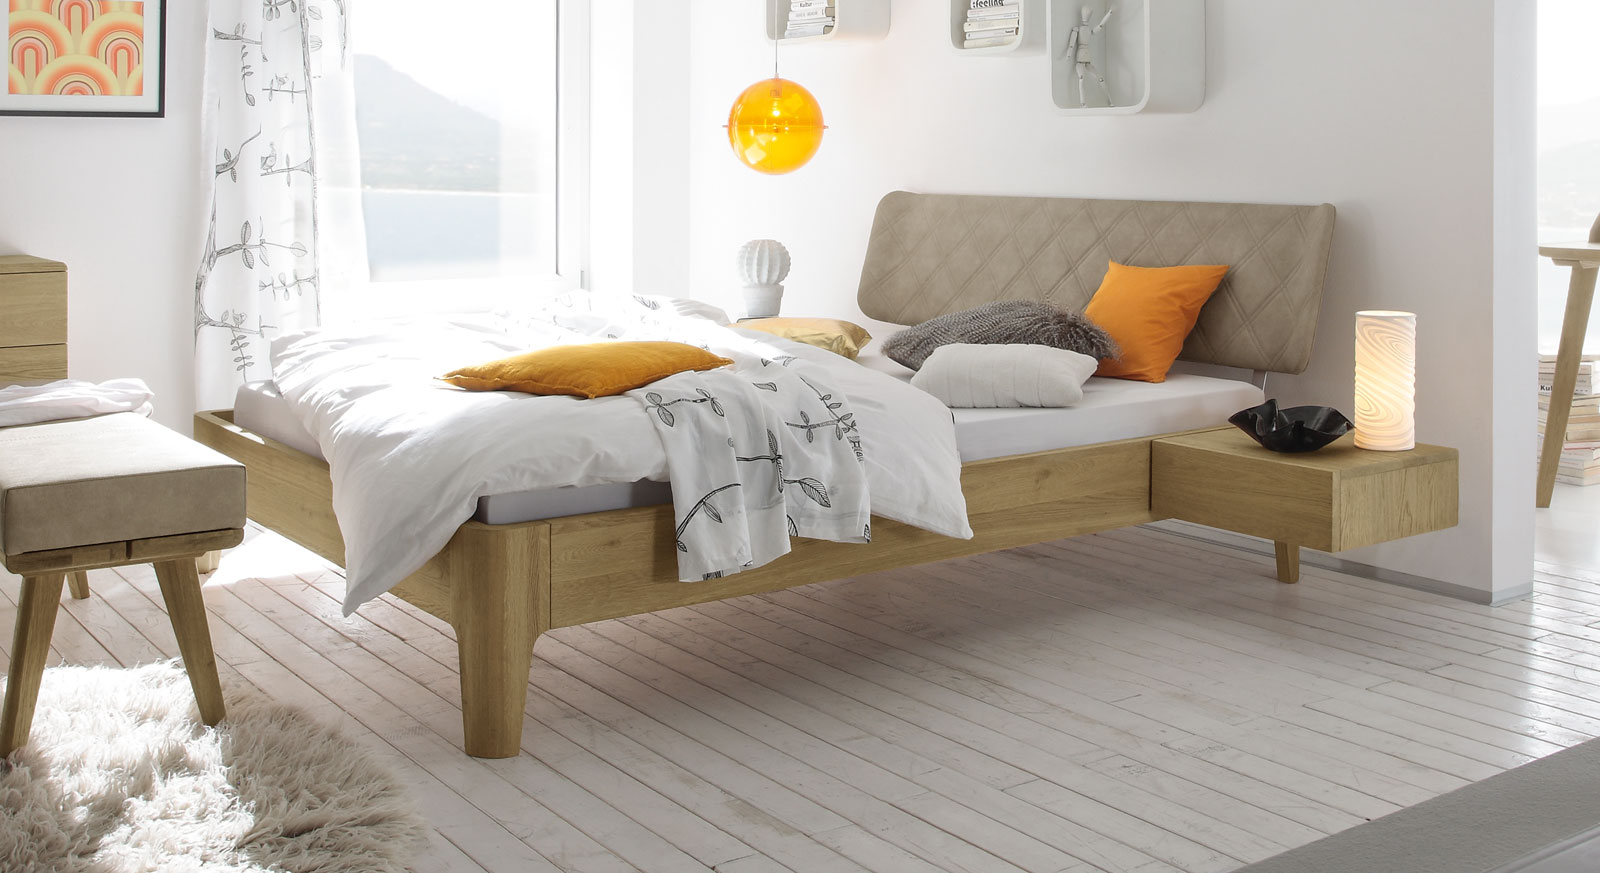 stunning modernes bett design trends 2012 images - globexusa, Schlafzimmer entwurf